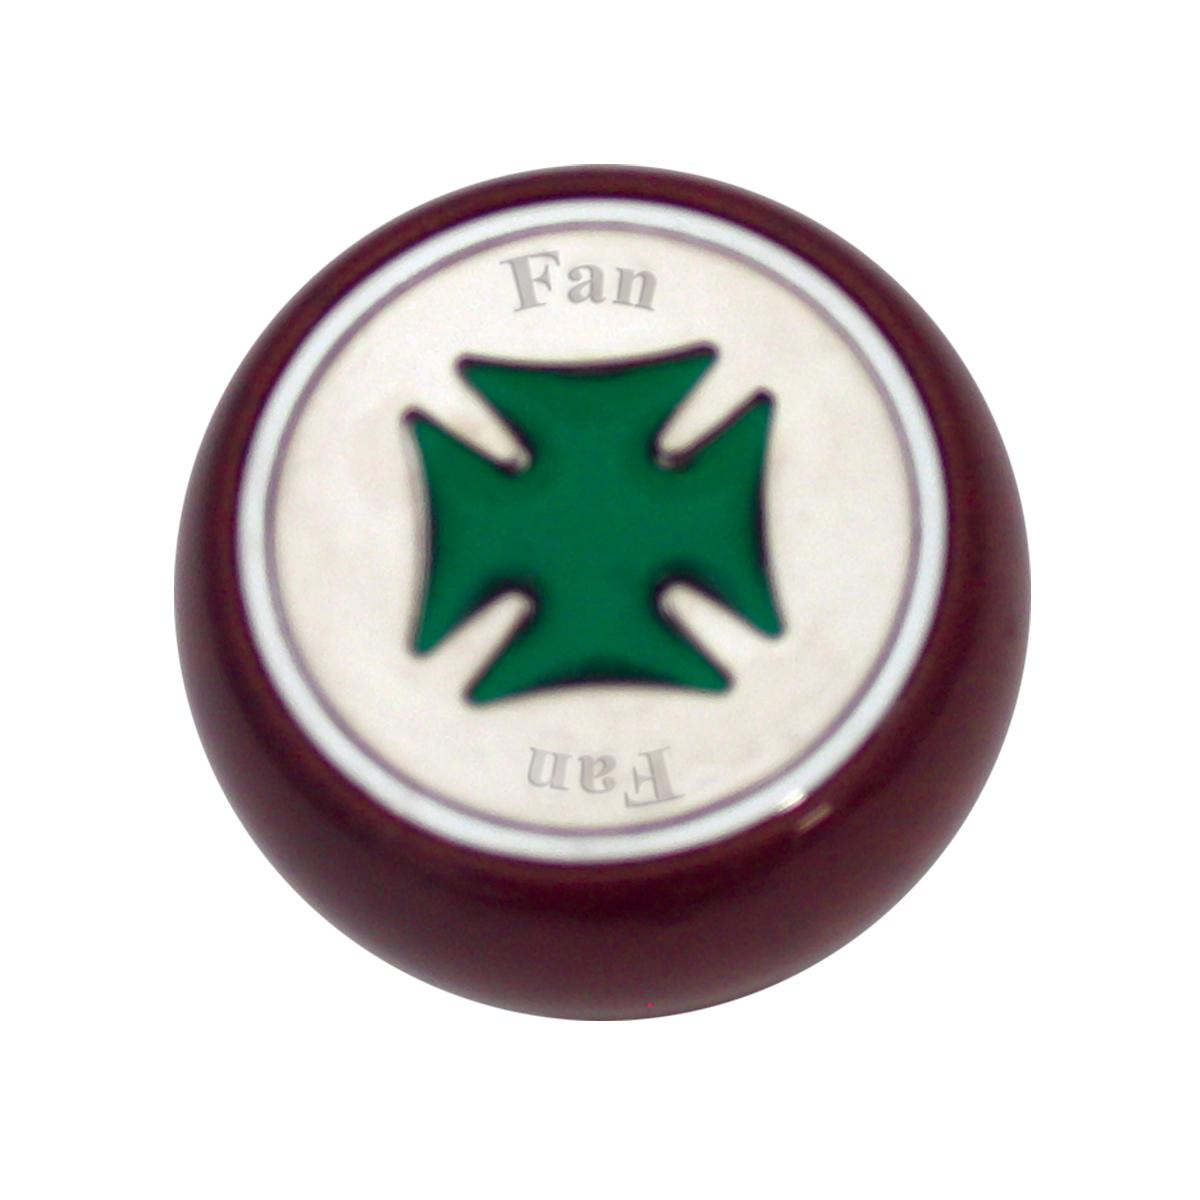 95463 Green Iron Cross Dashboard Control Knob w/ Fan Script